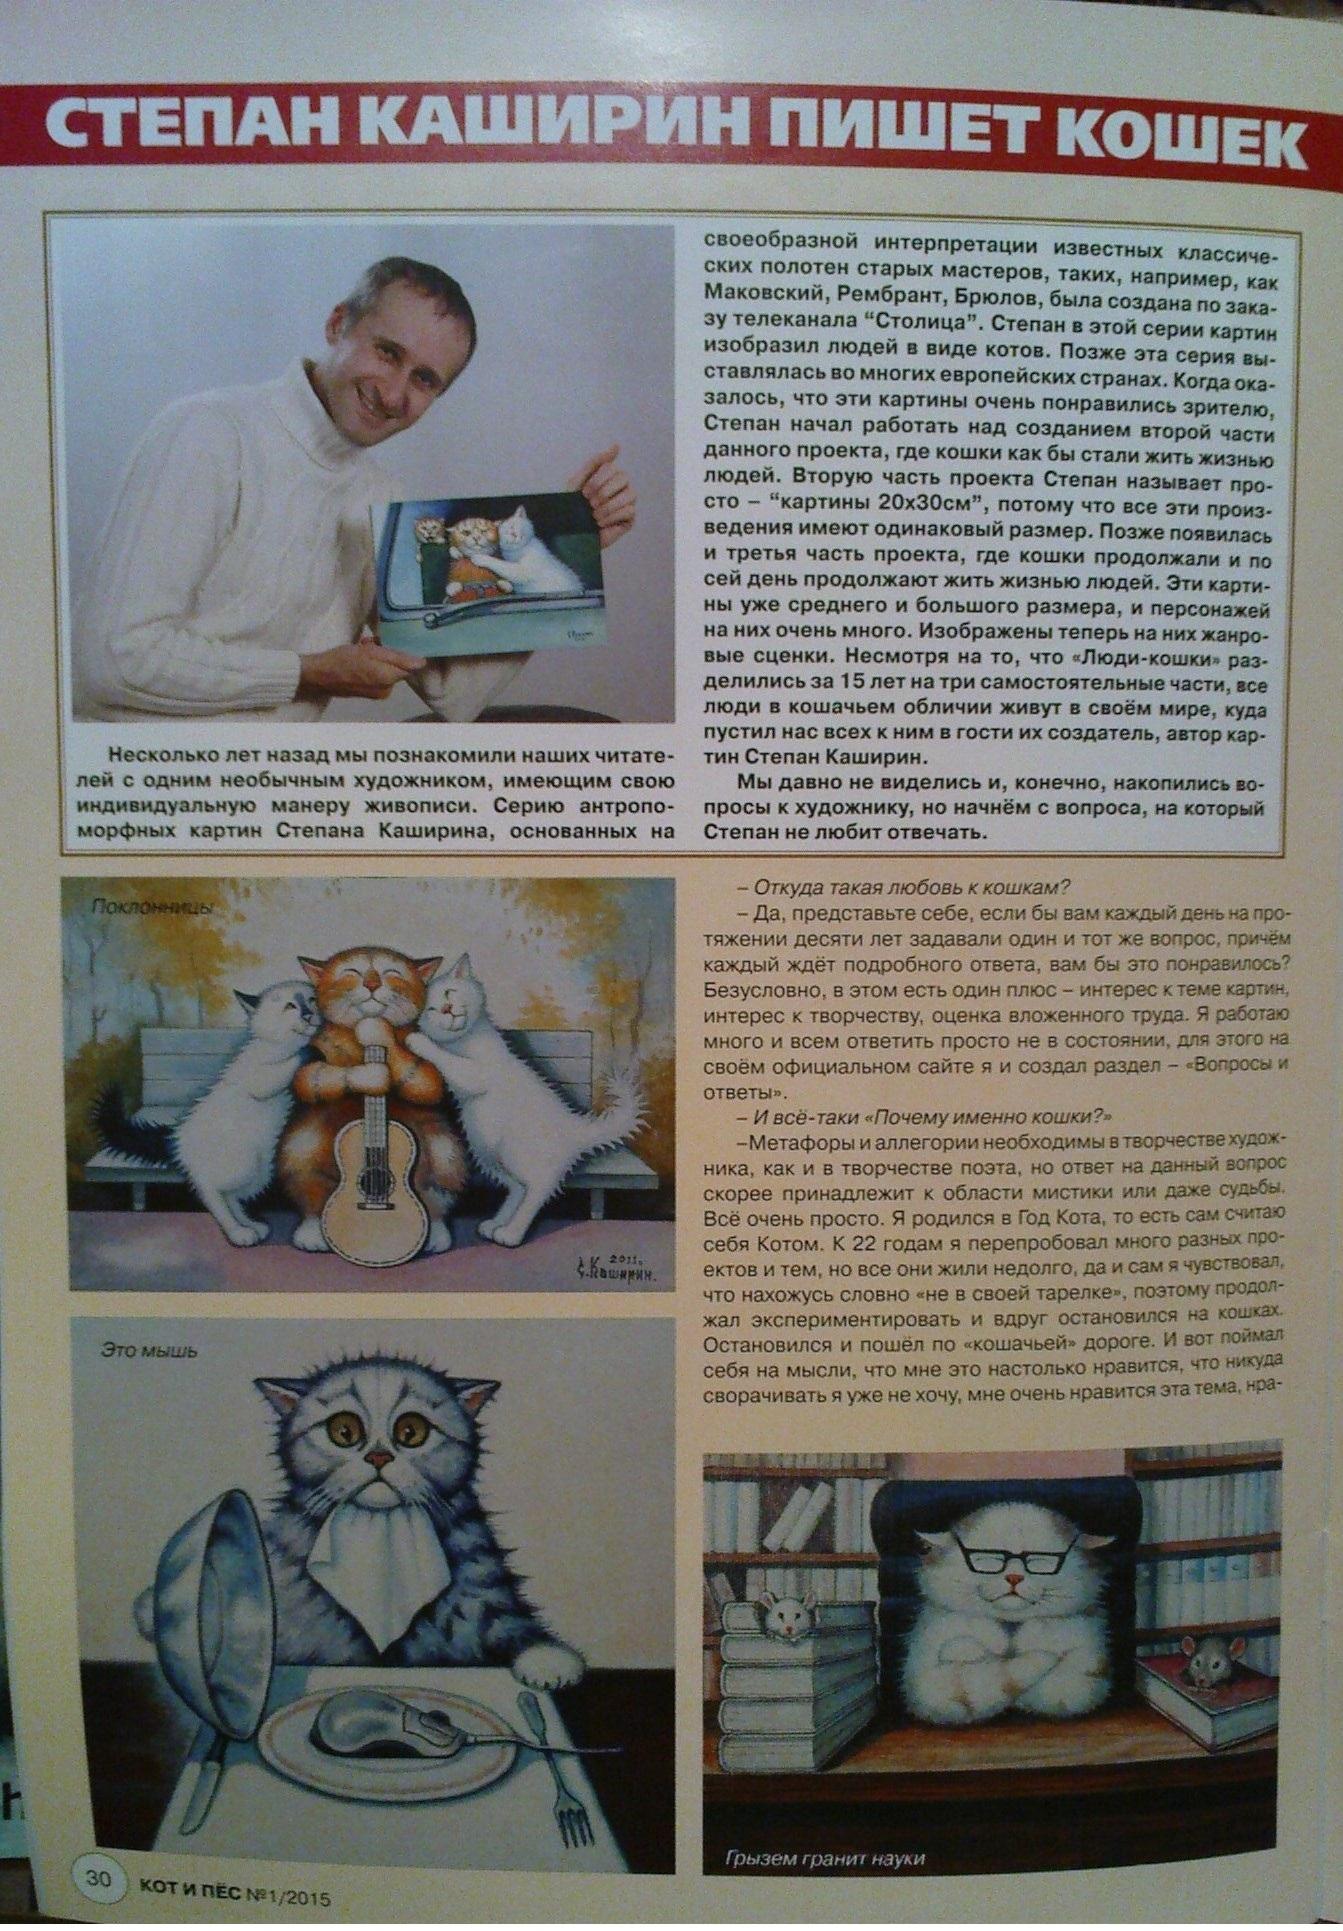 http://www.stepan-kashirin.ru/files/kot-i-pyos-2015-pervaja.jpg